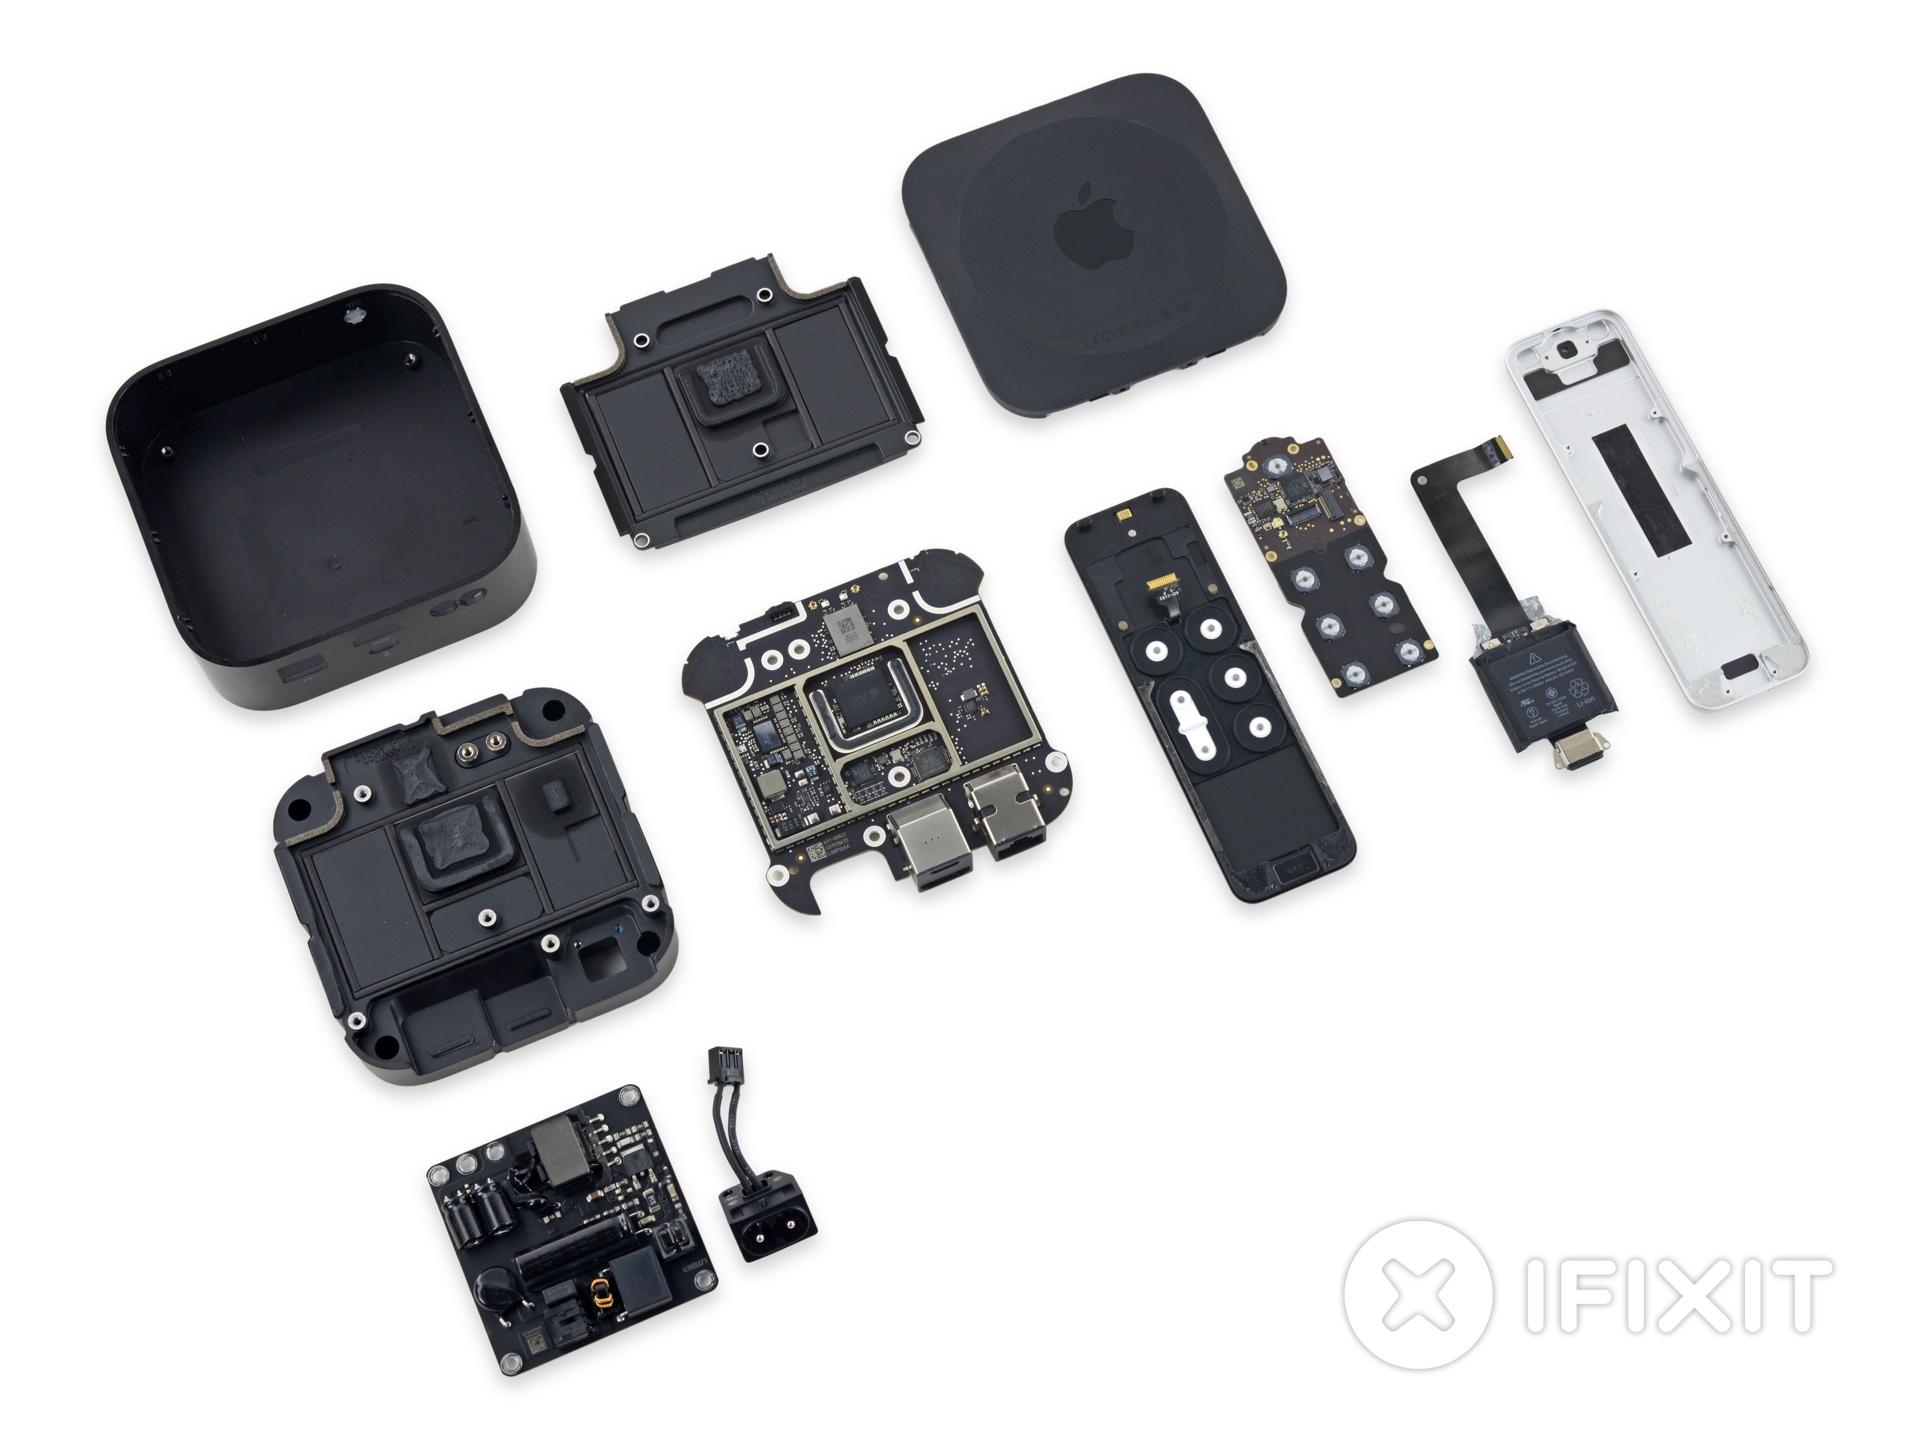 Nova Apple TV desmontada pela iFixit